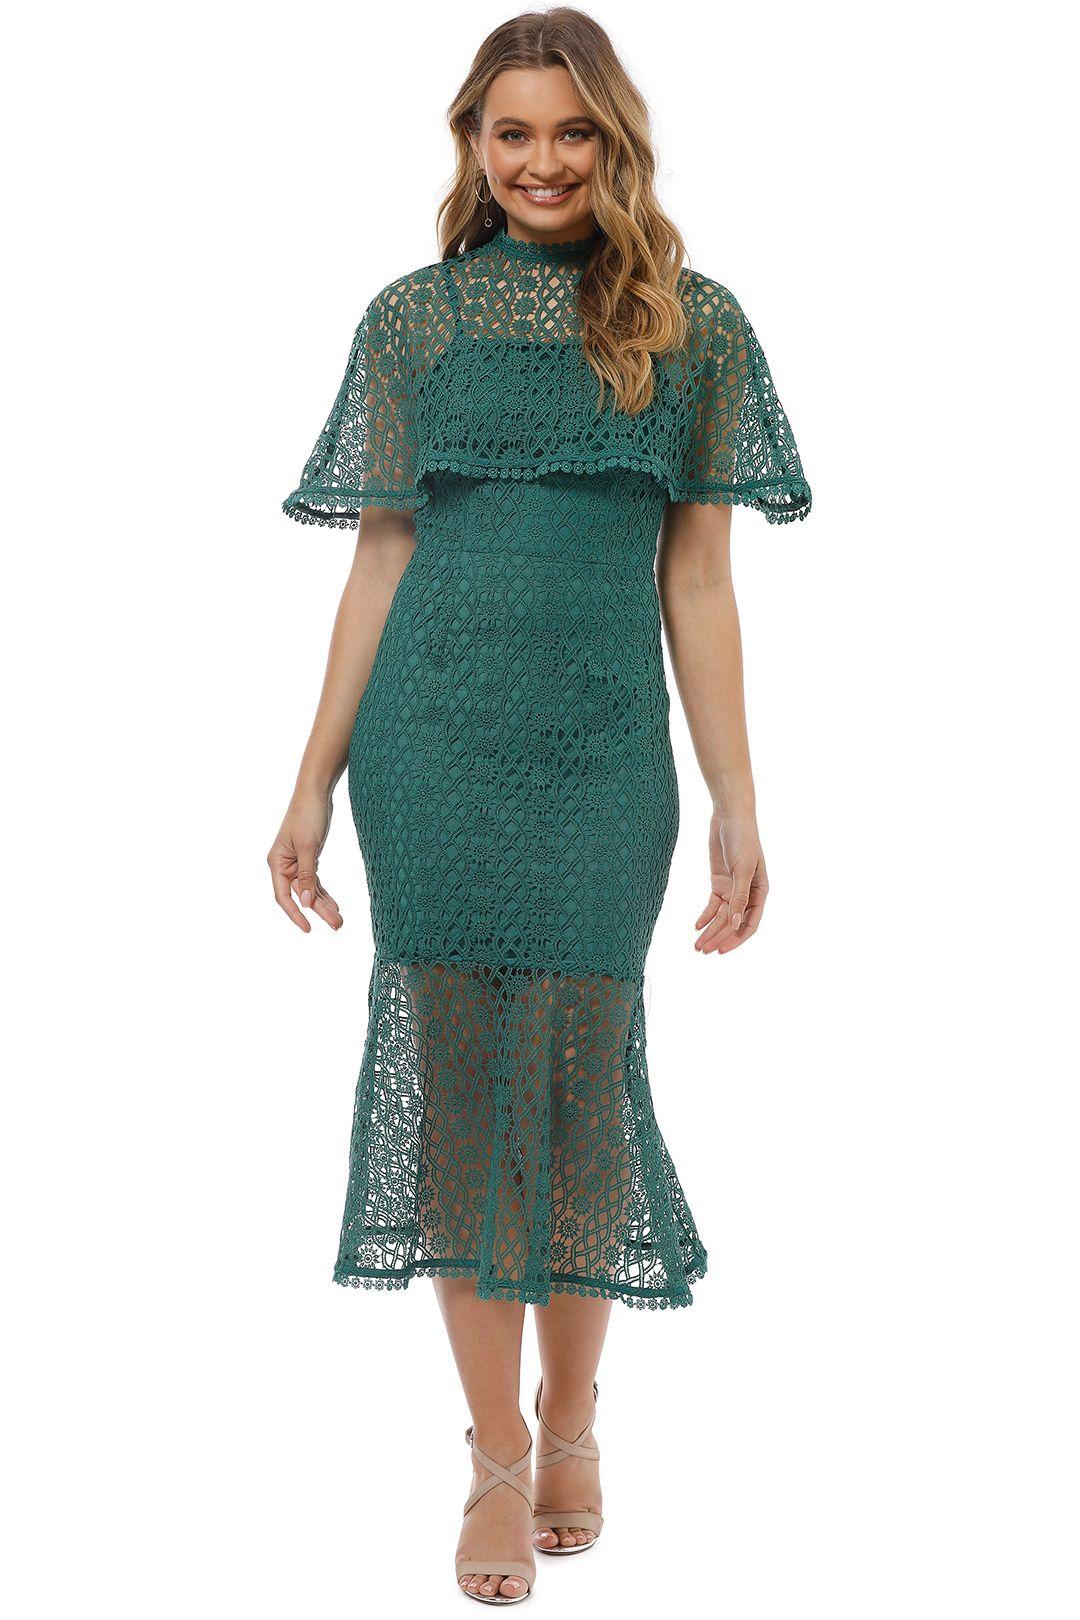 Grace and Hart - Dentelle Midi Dress - Pine - Front